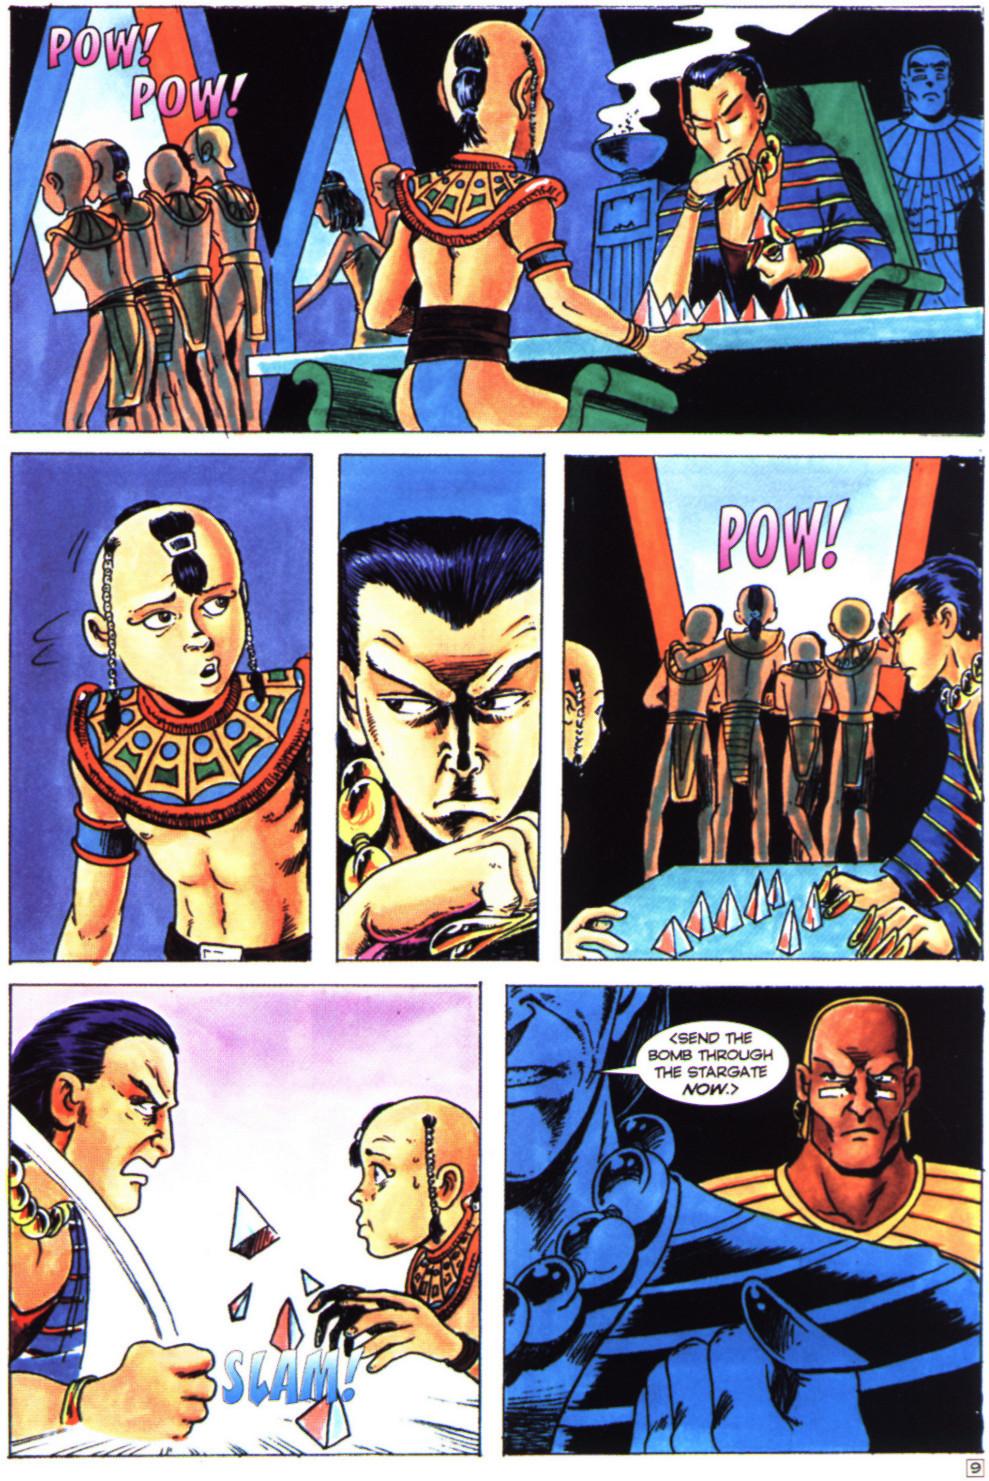 Read online Stargate comic -  Issue #4 - 11